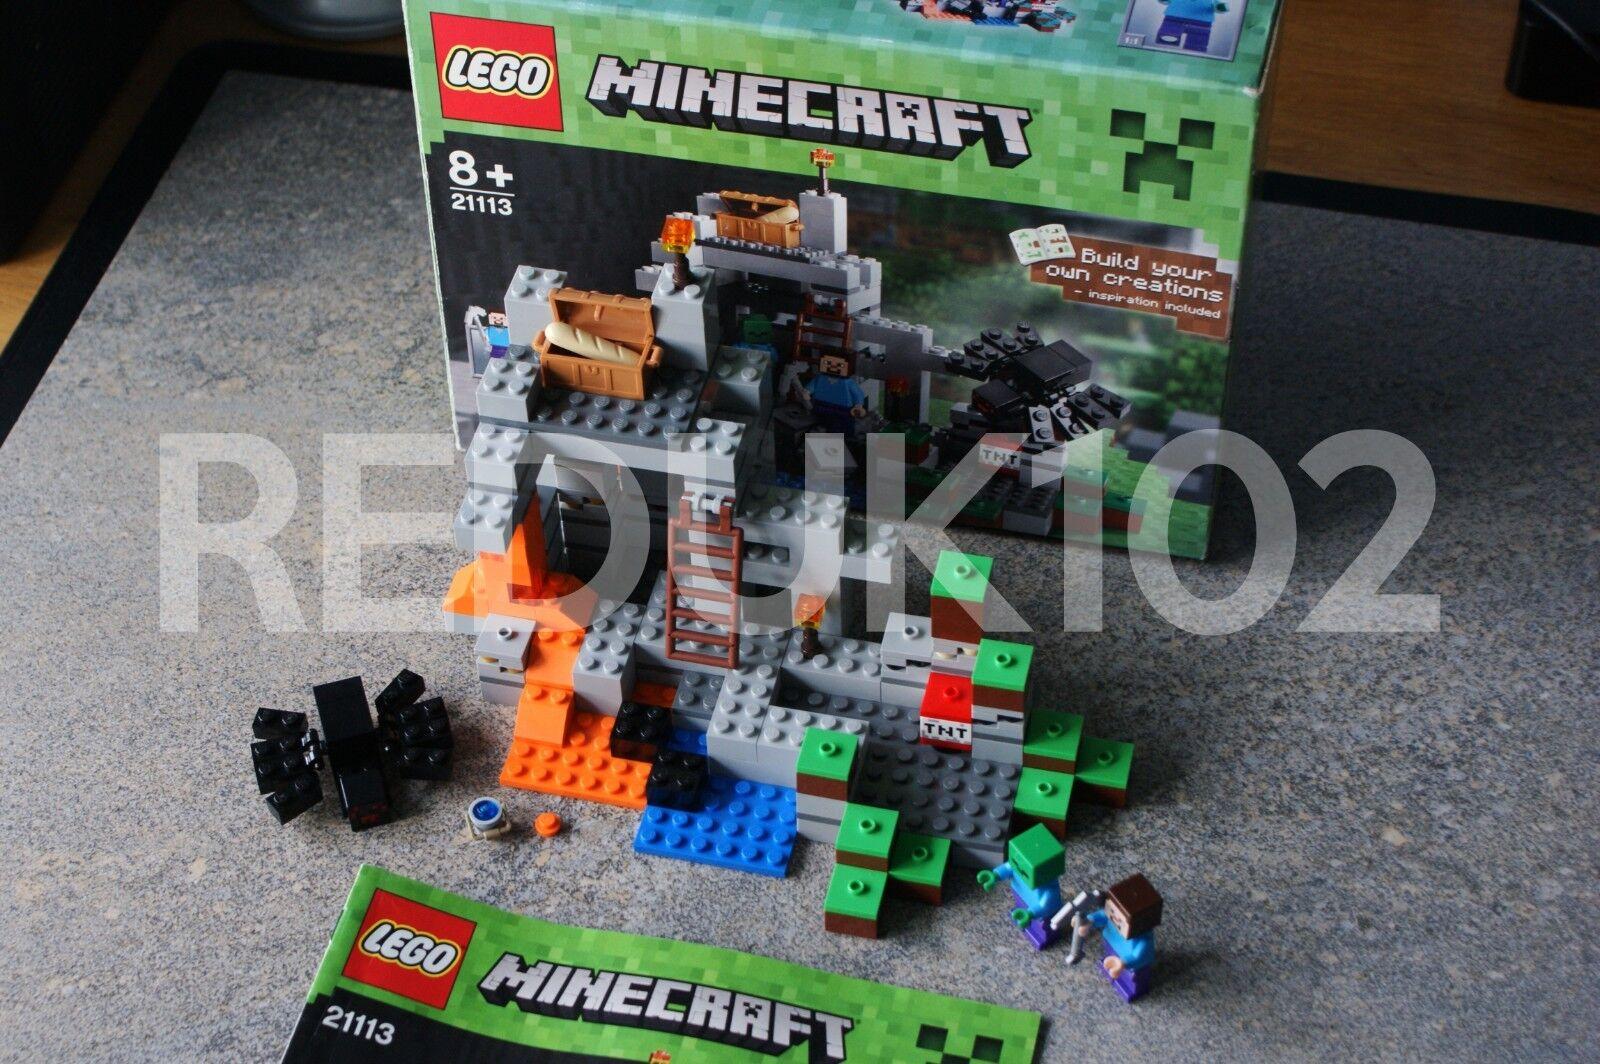 Lego Minecraft La Grougete Set 21113 100% complet  boîte Instructions incluses